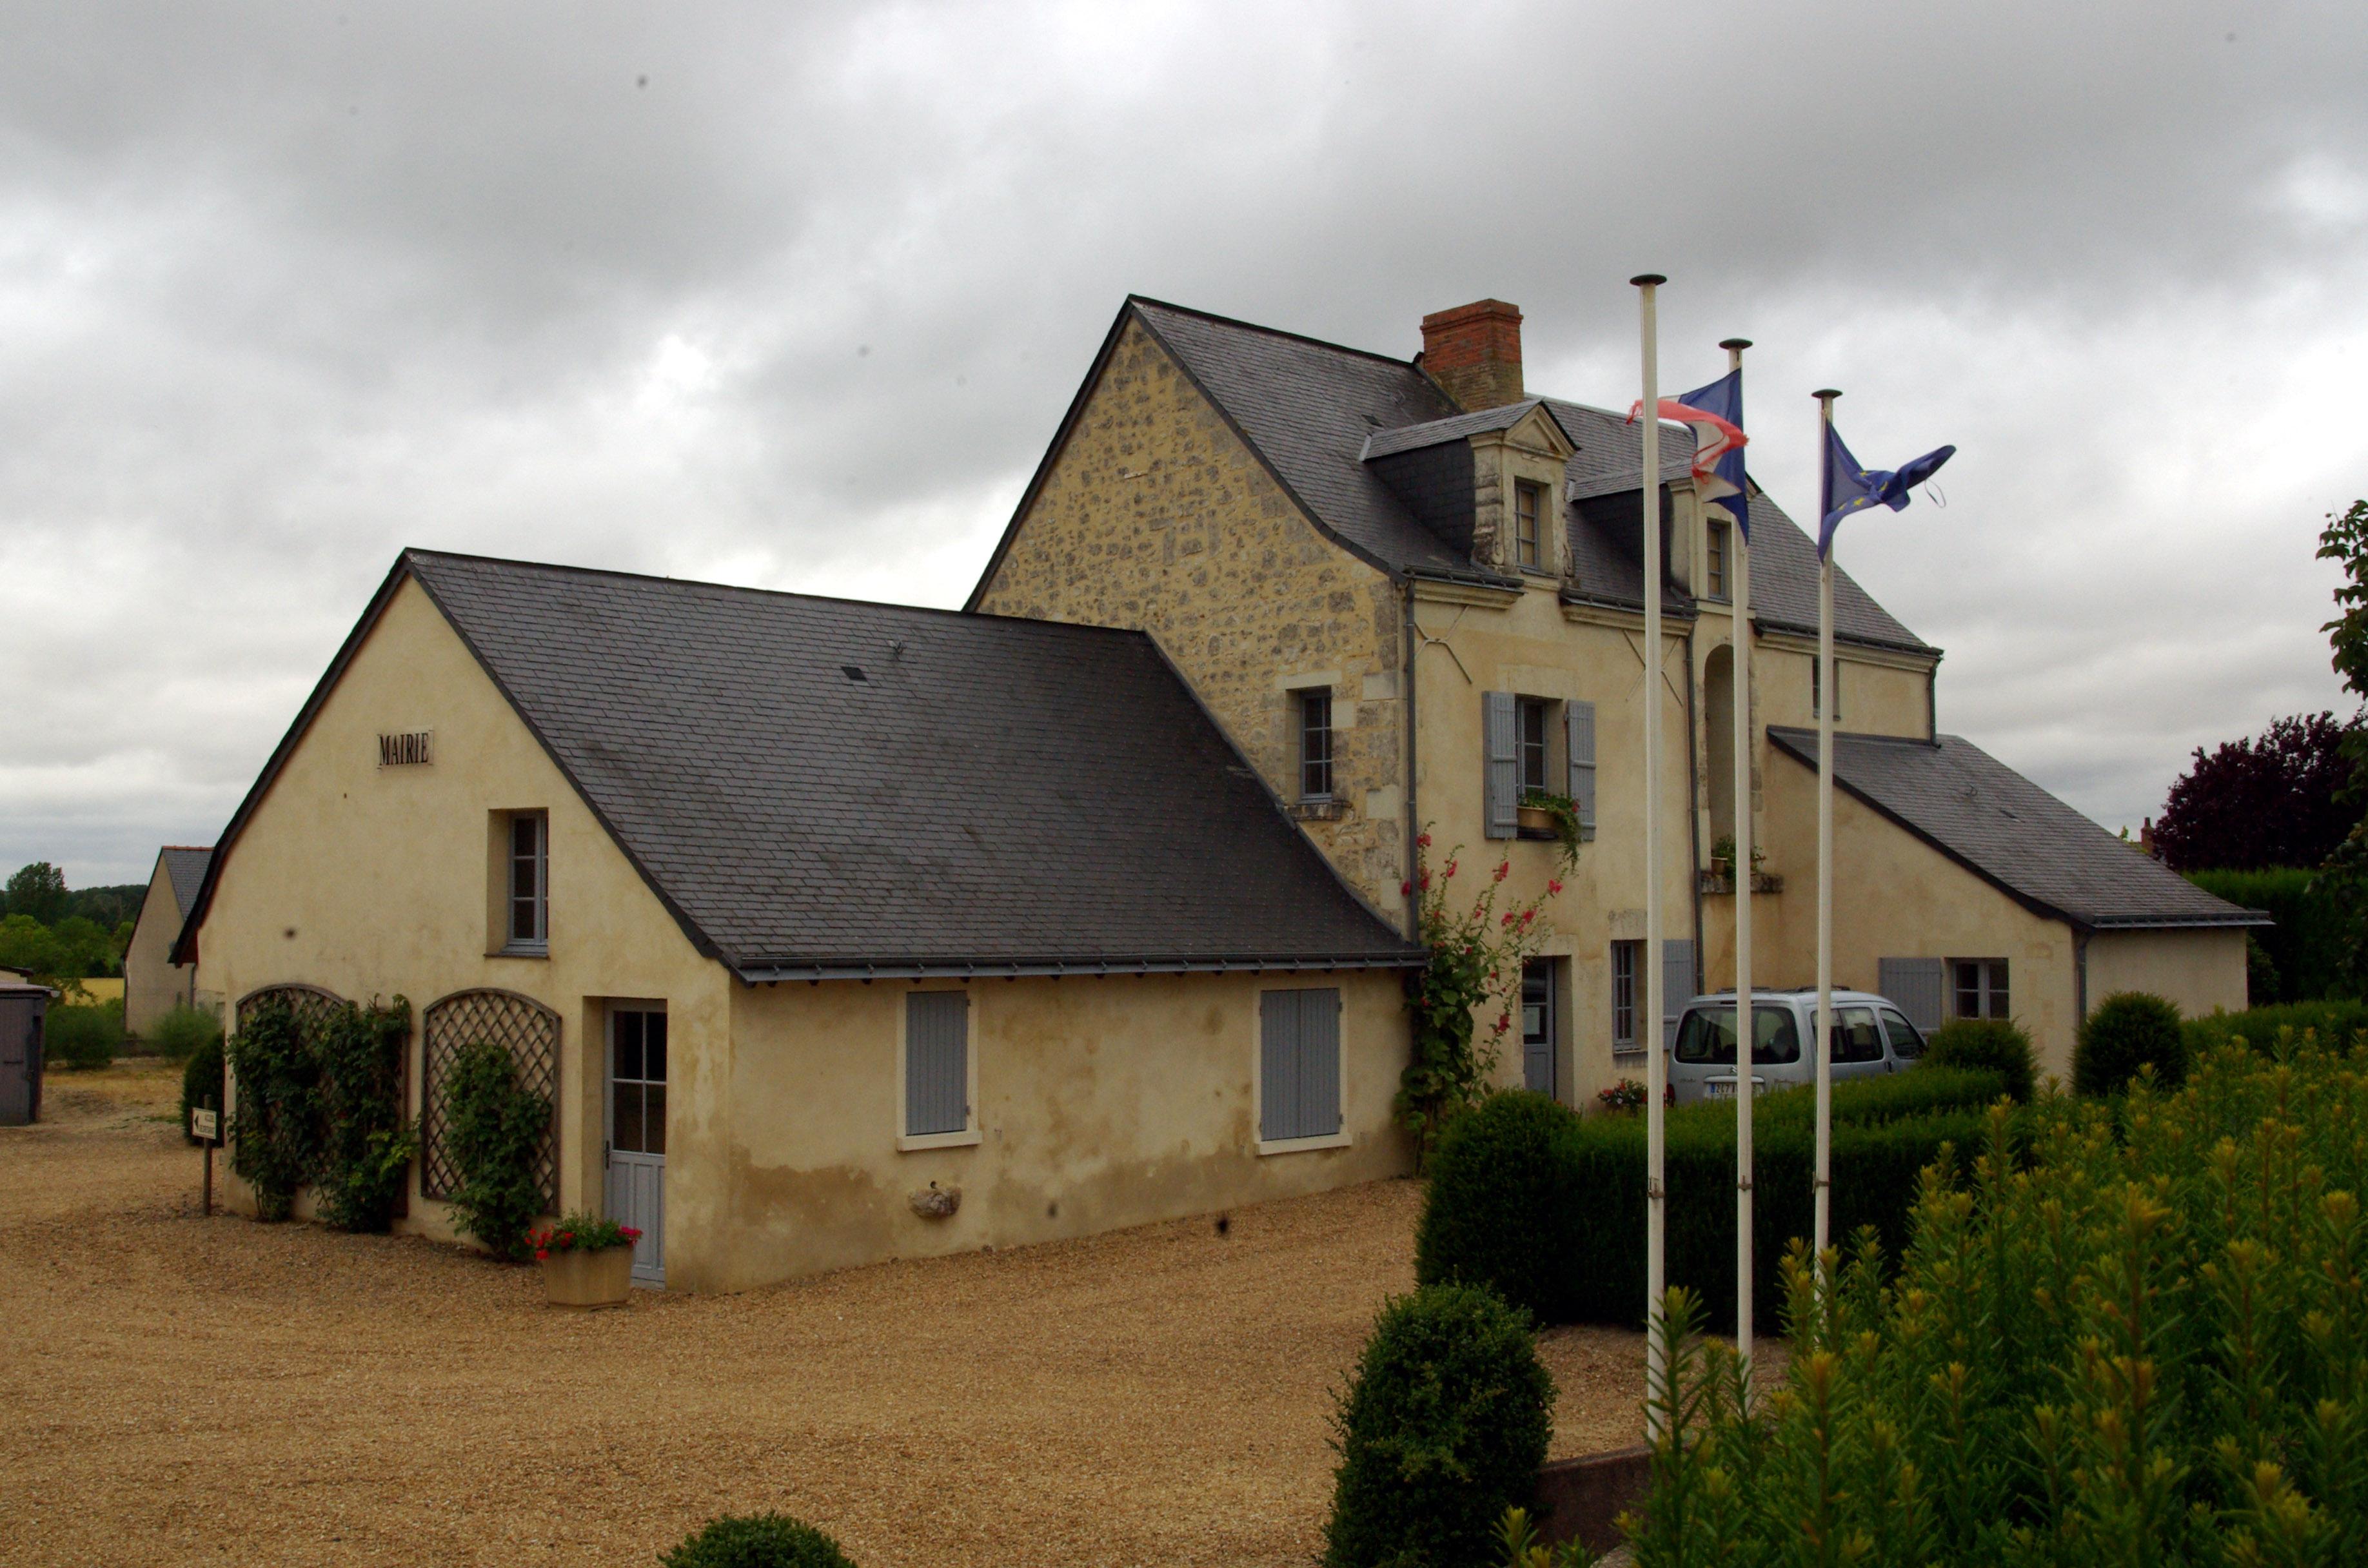 Lué-en-Baugeois